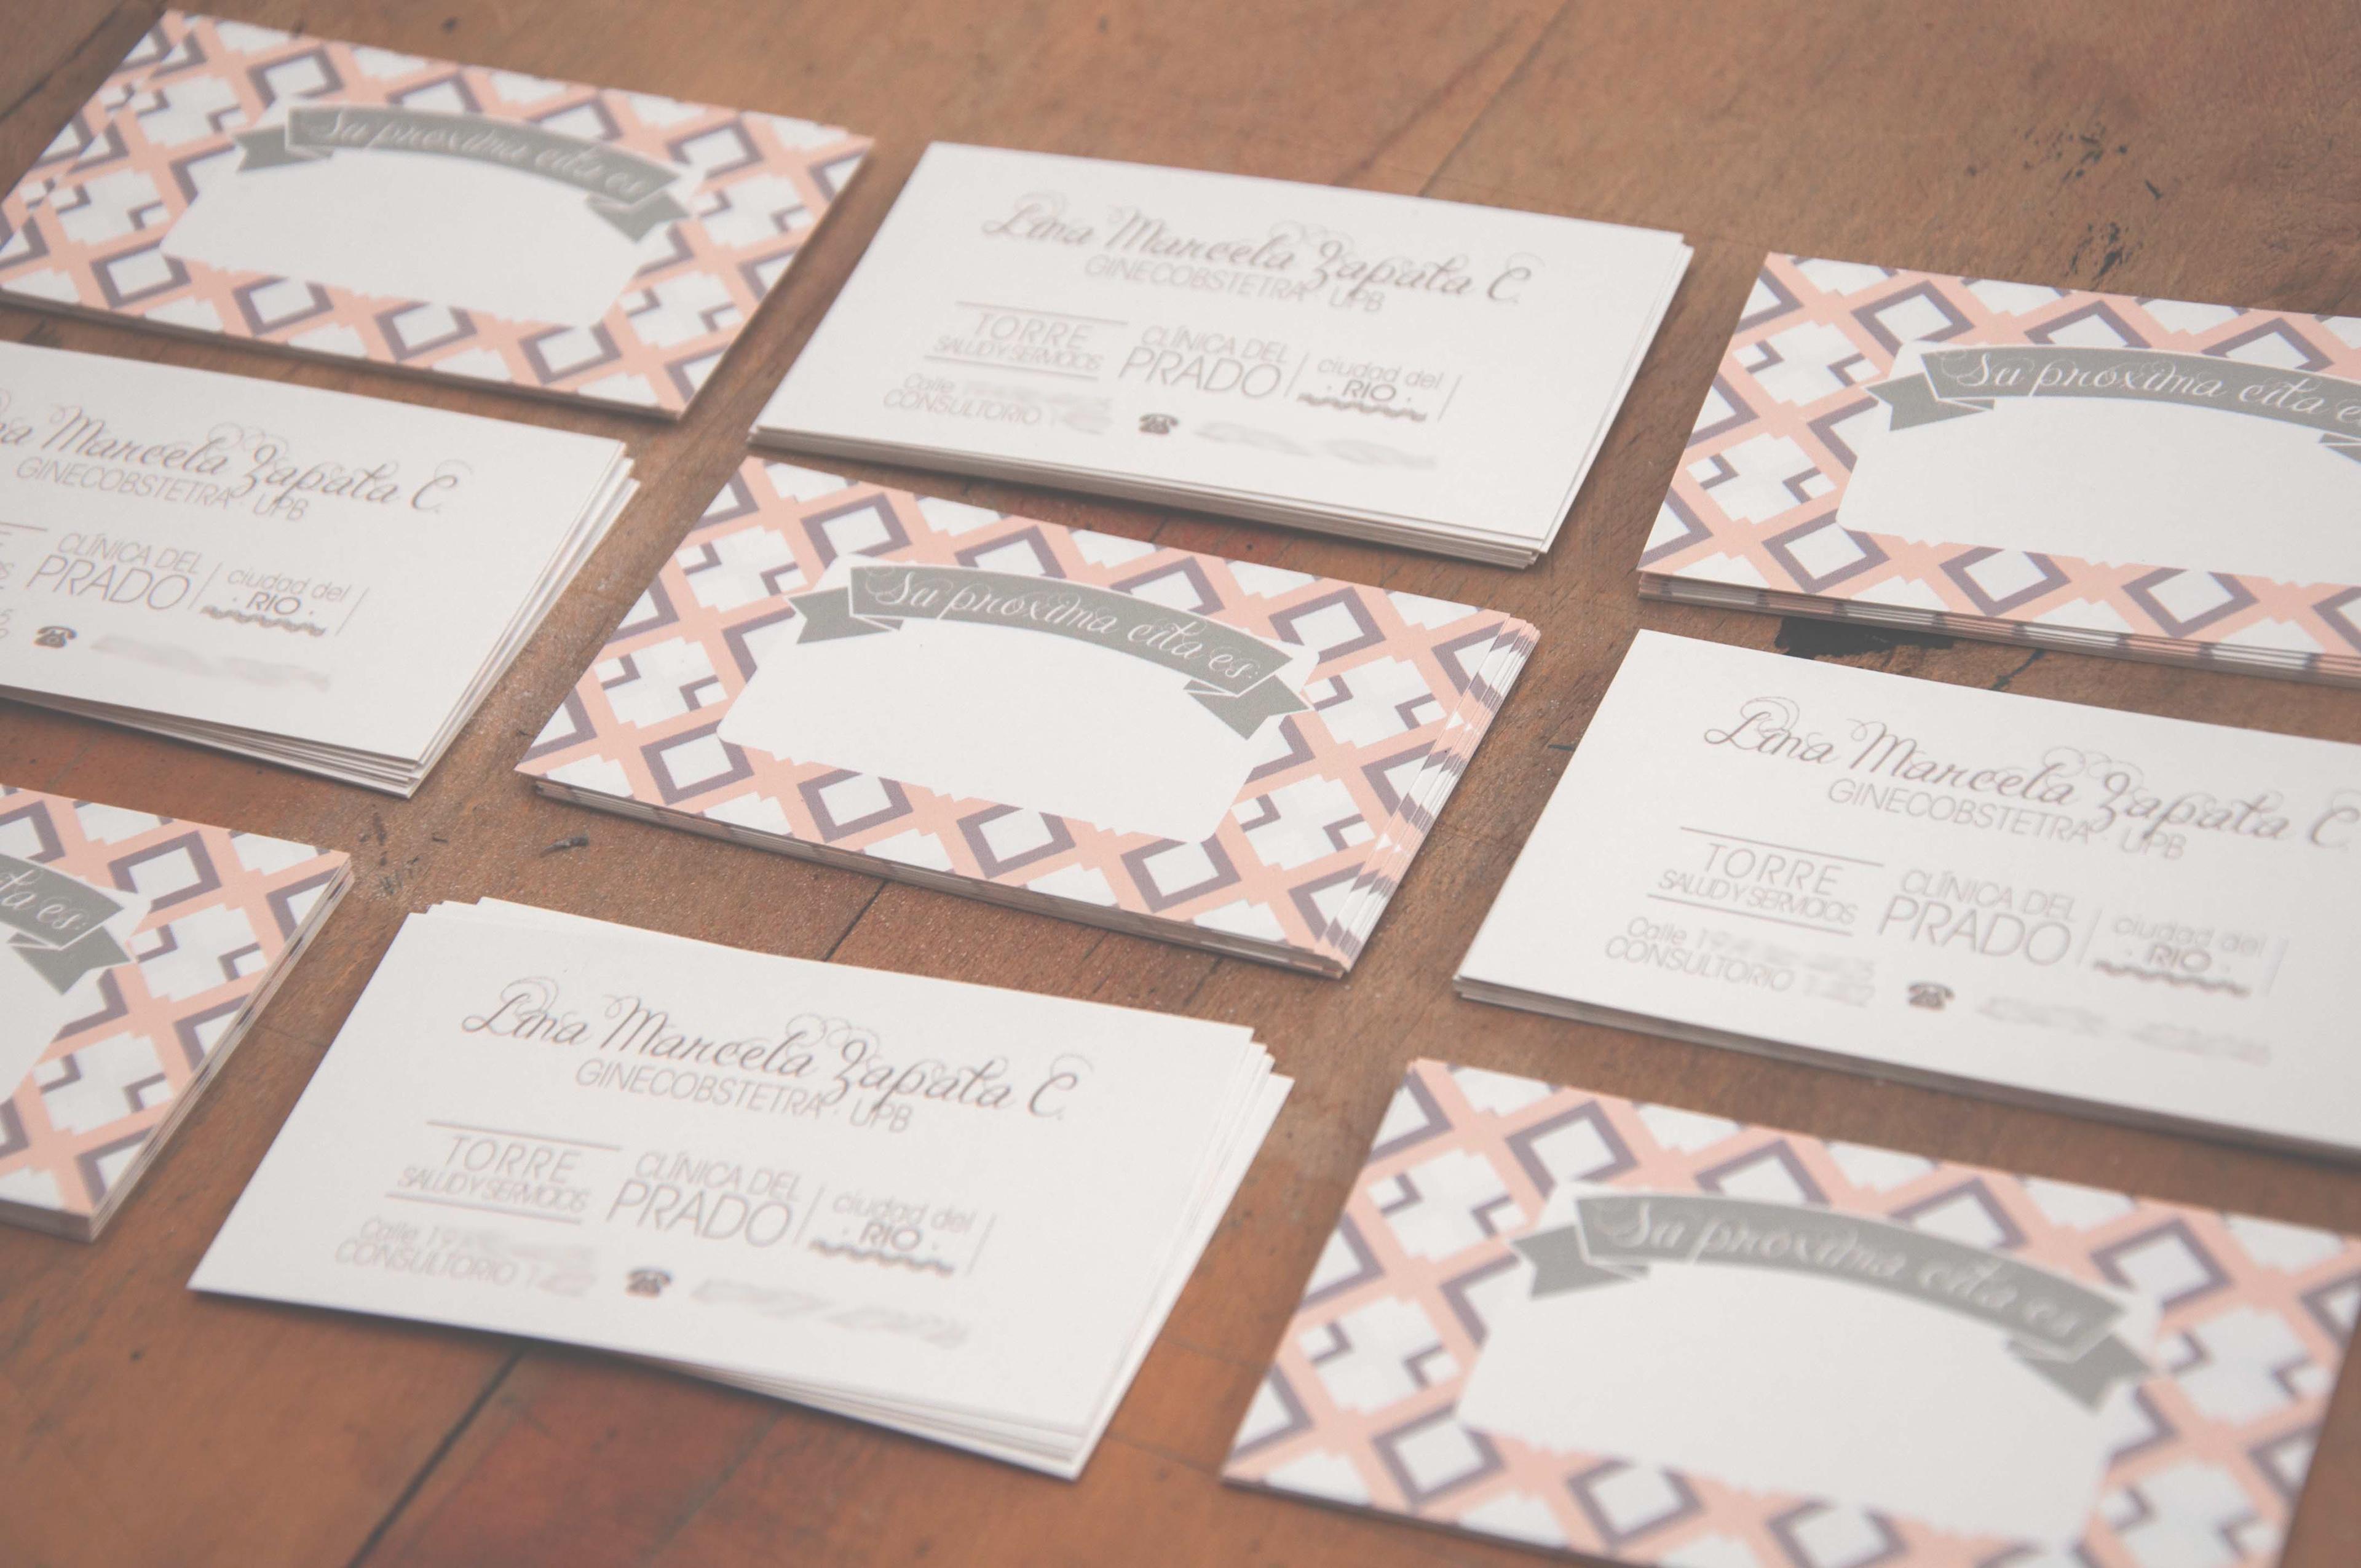 Lina Moreno Business Cards and recipe sheets Dr Lina M Zapata